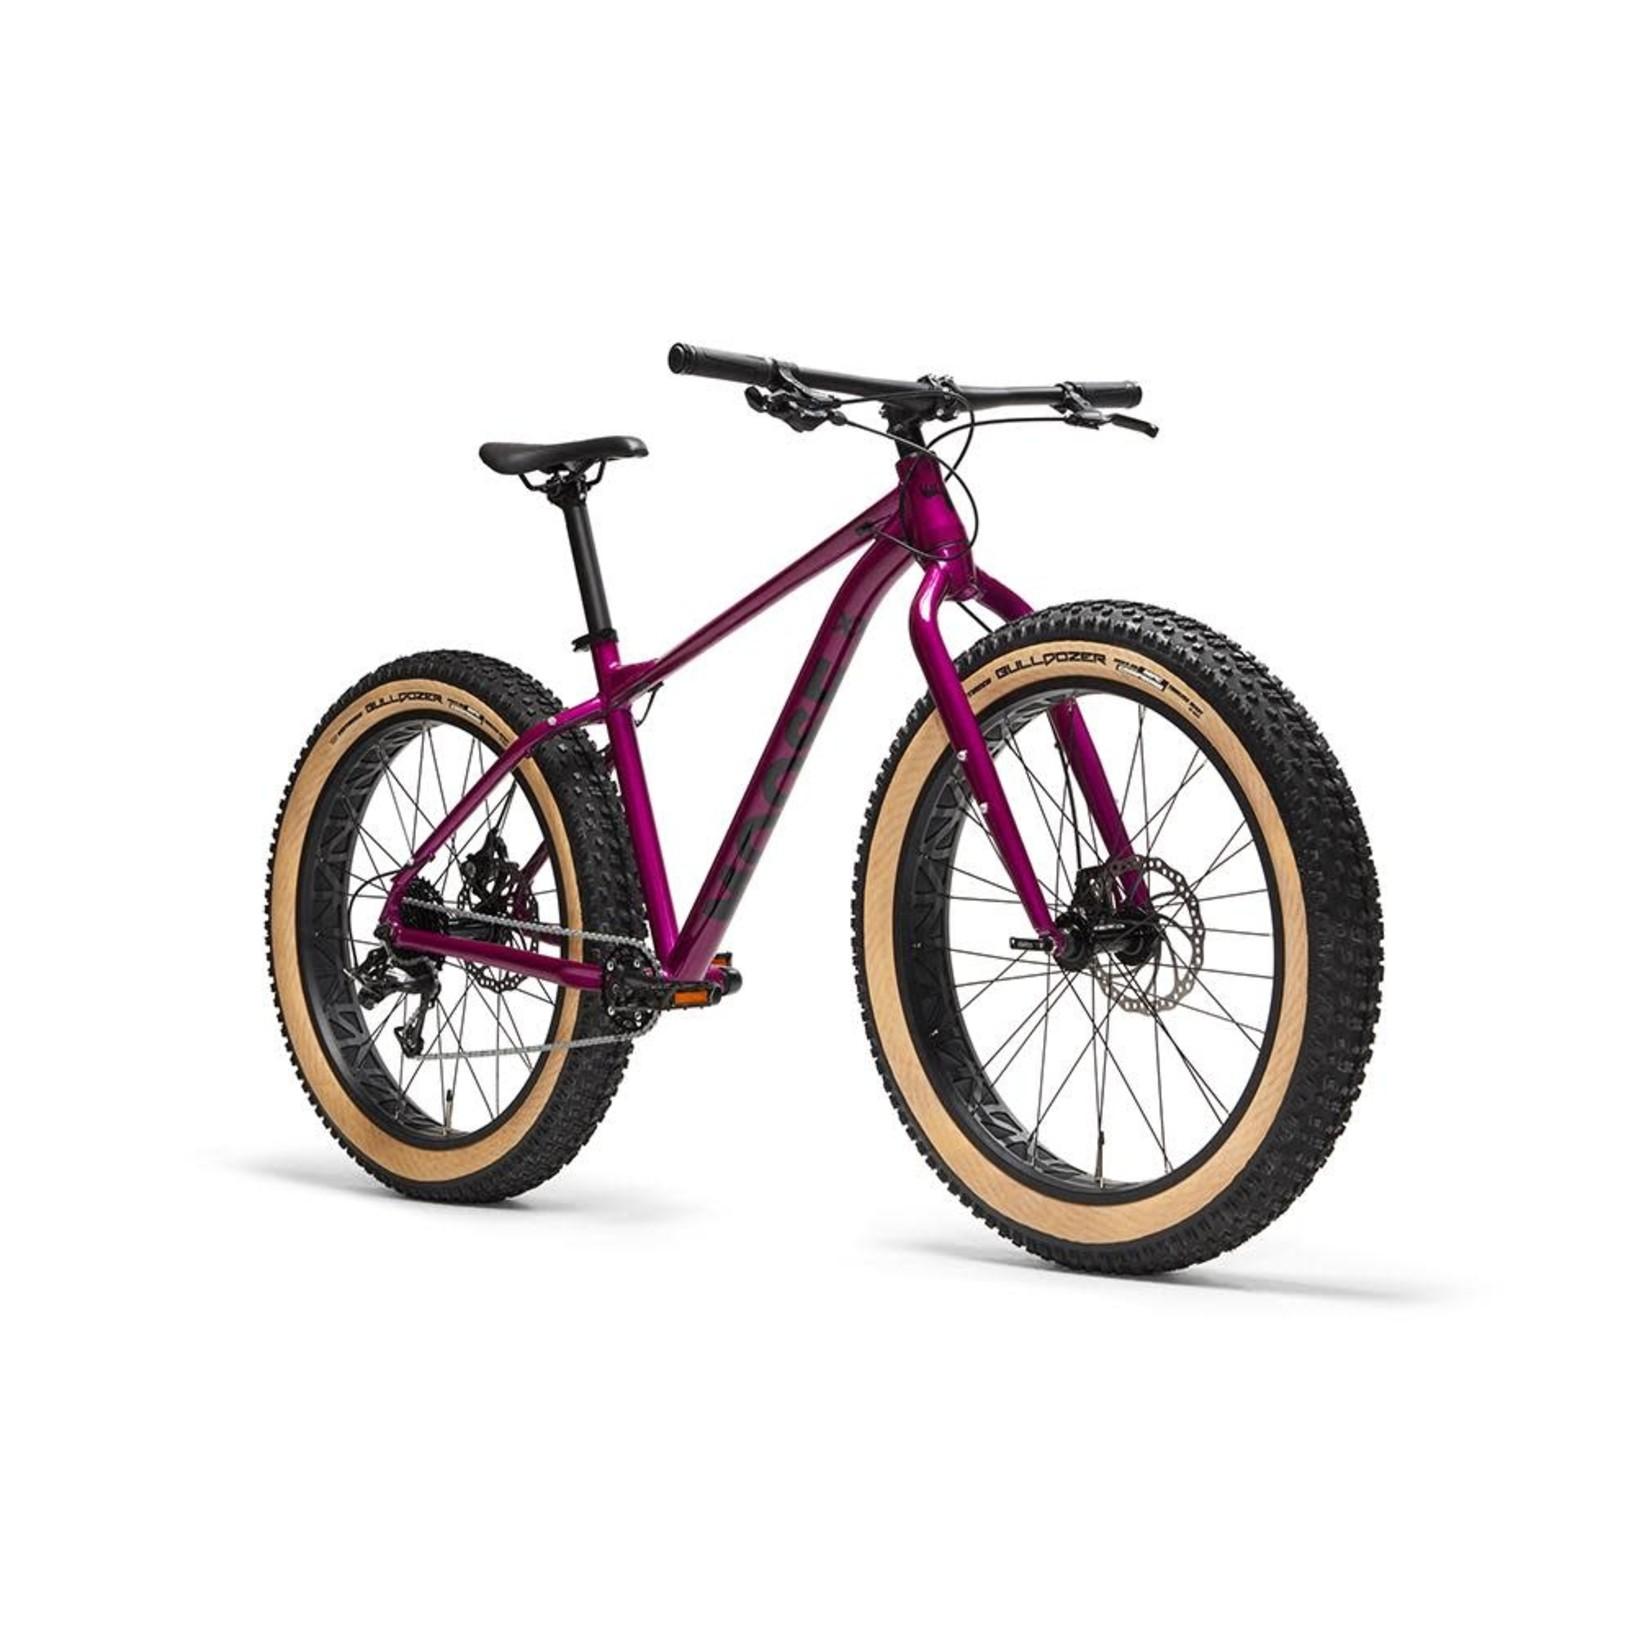 Moose Bicycle FAT 1.0 Purple M